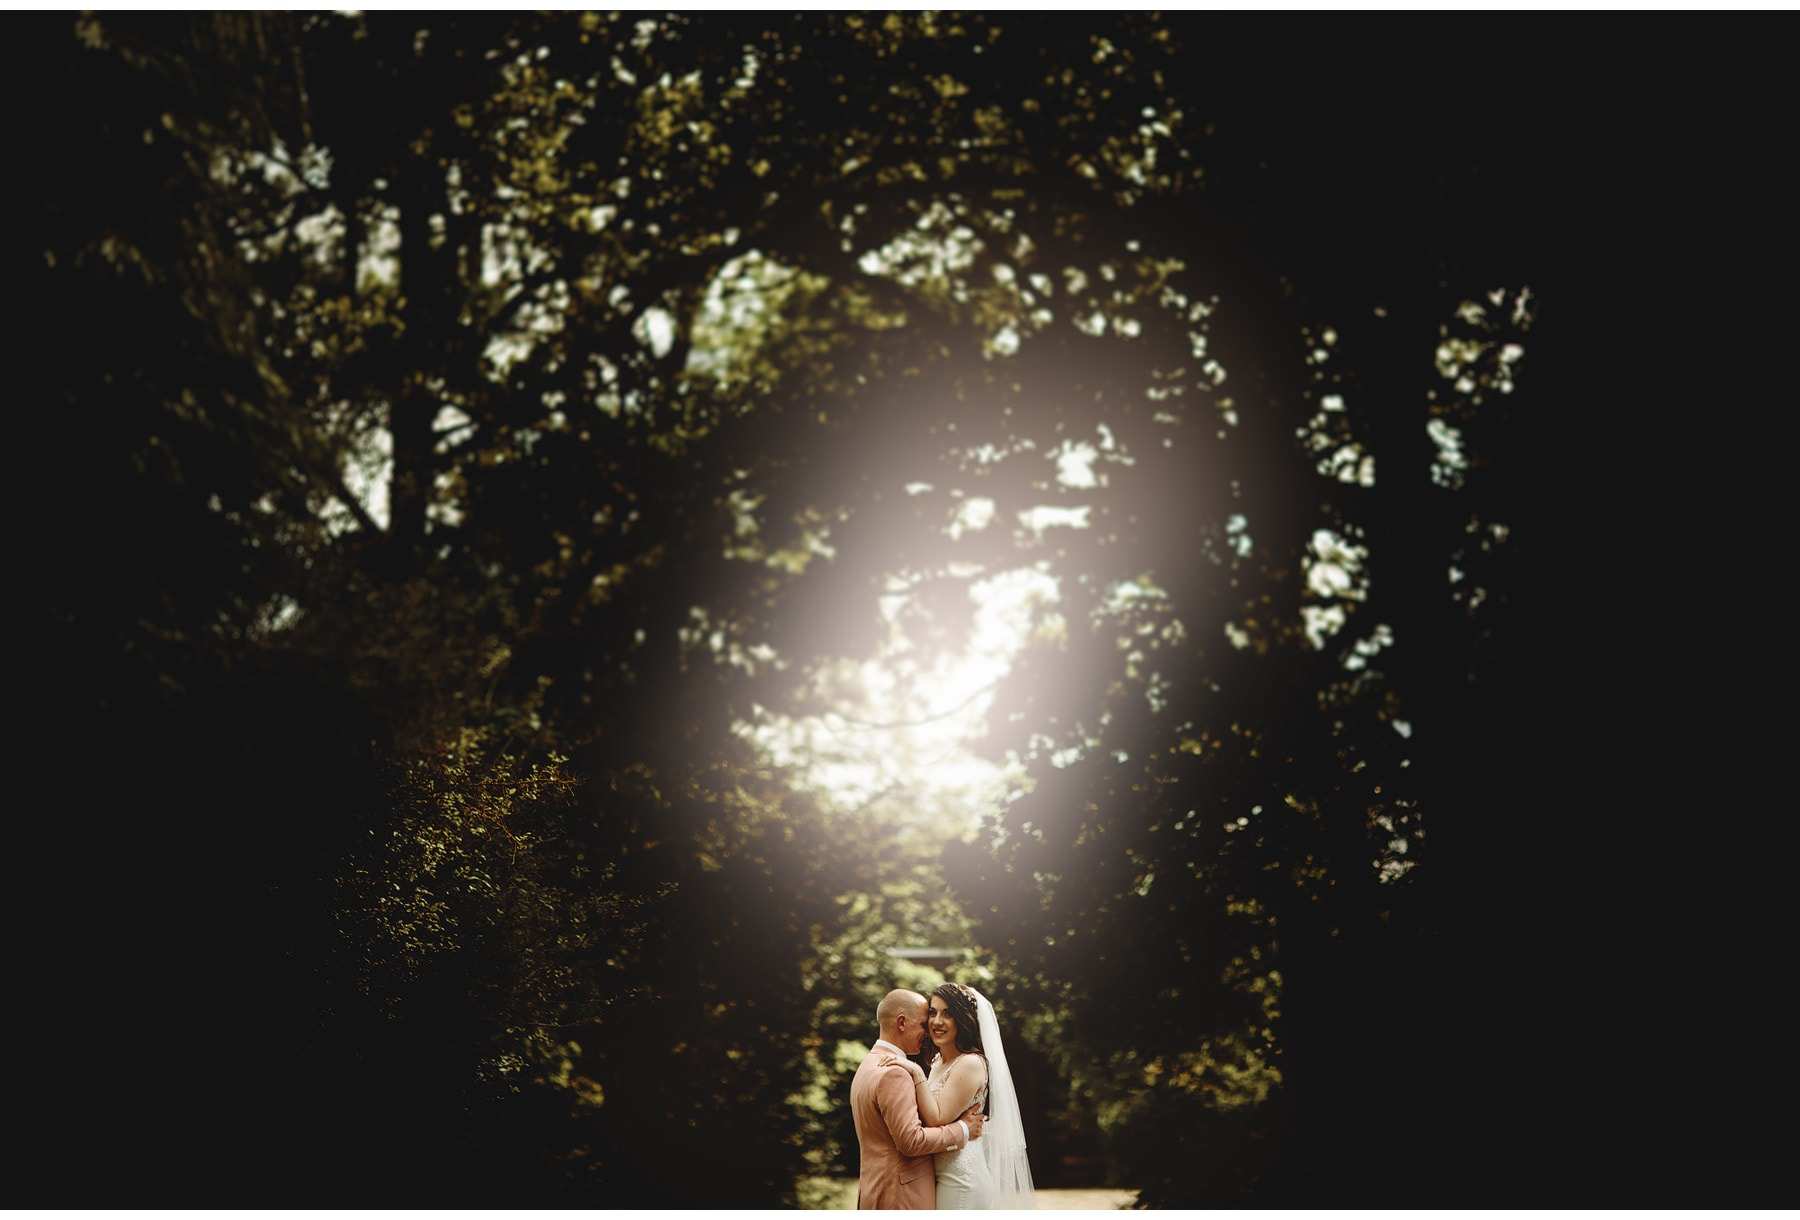 the bride & groom in sun flare